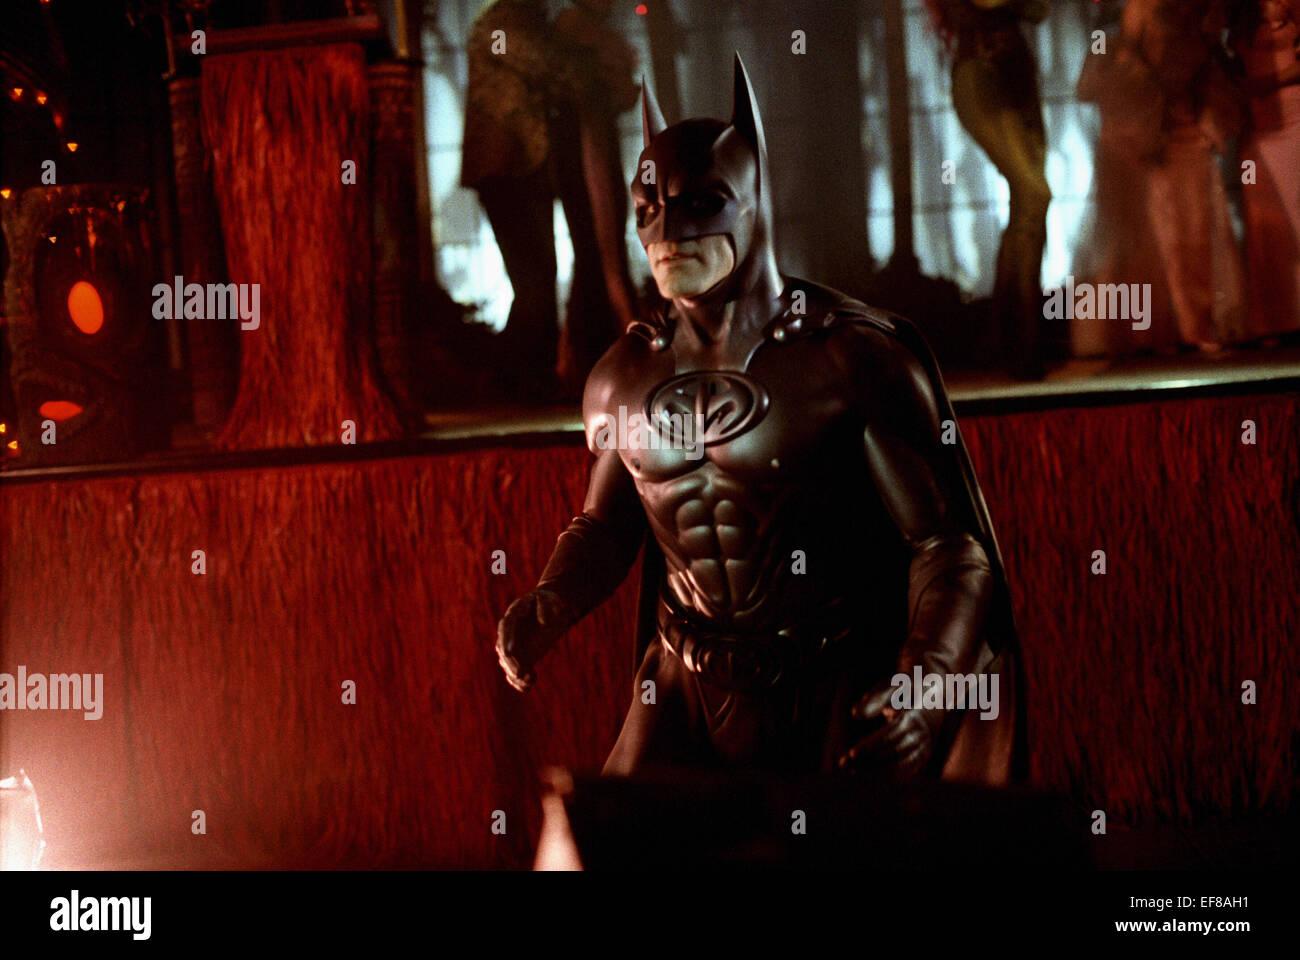 George Clooney Batman Robin 1997 Stock Photo Alamy